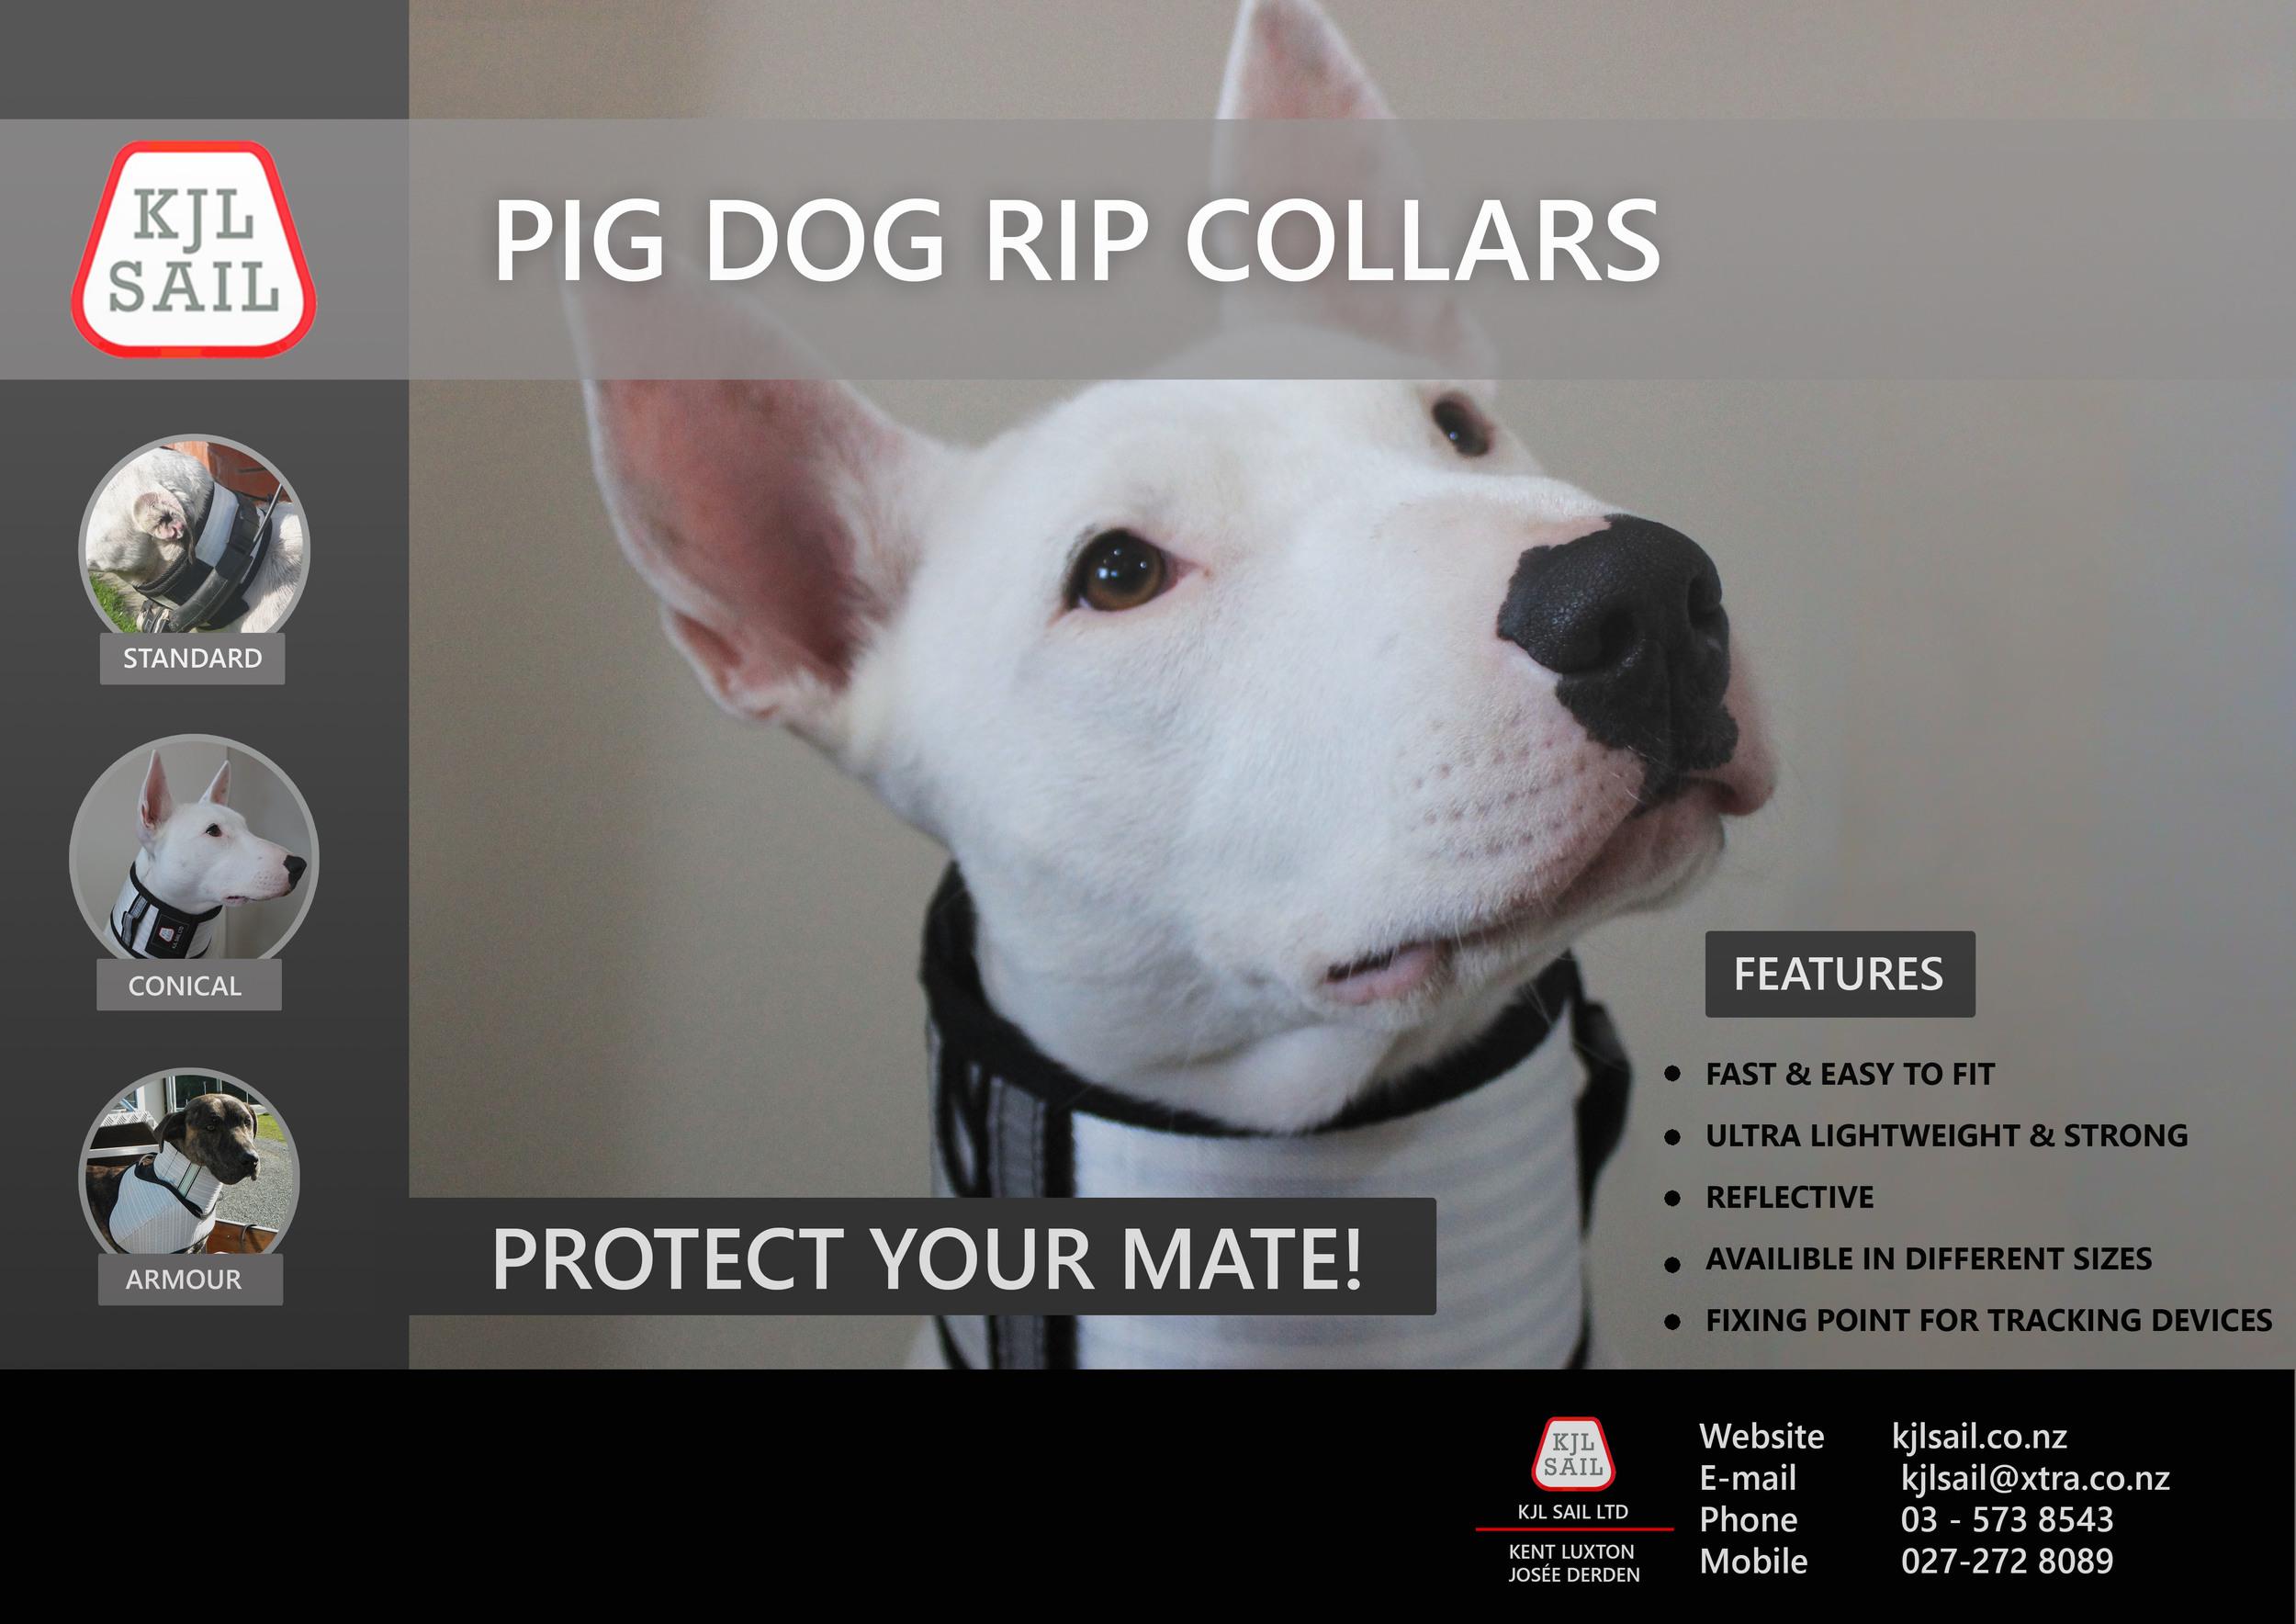 Pig dog Rip Collar New Zealand - Hunting supplies